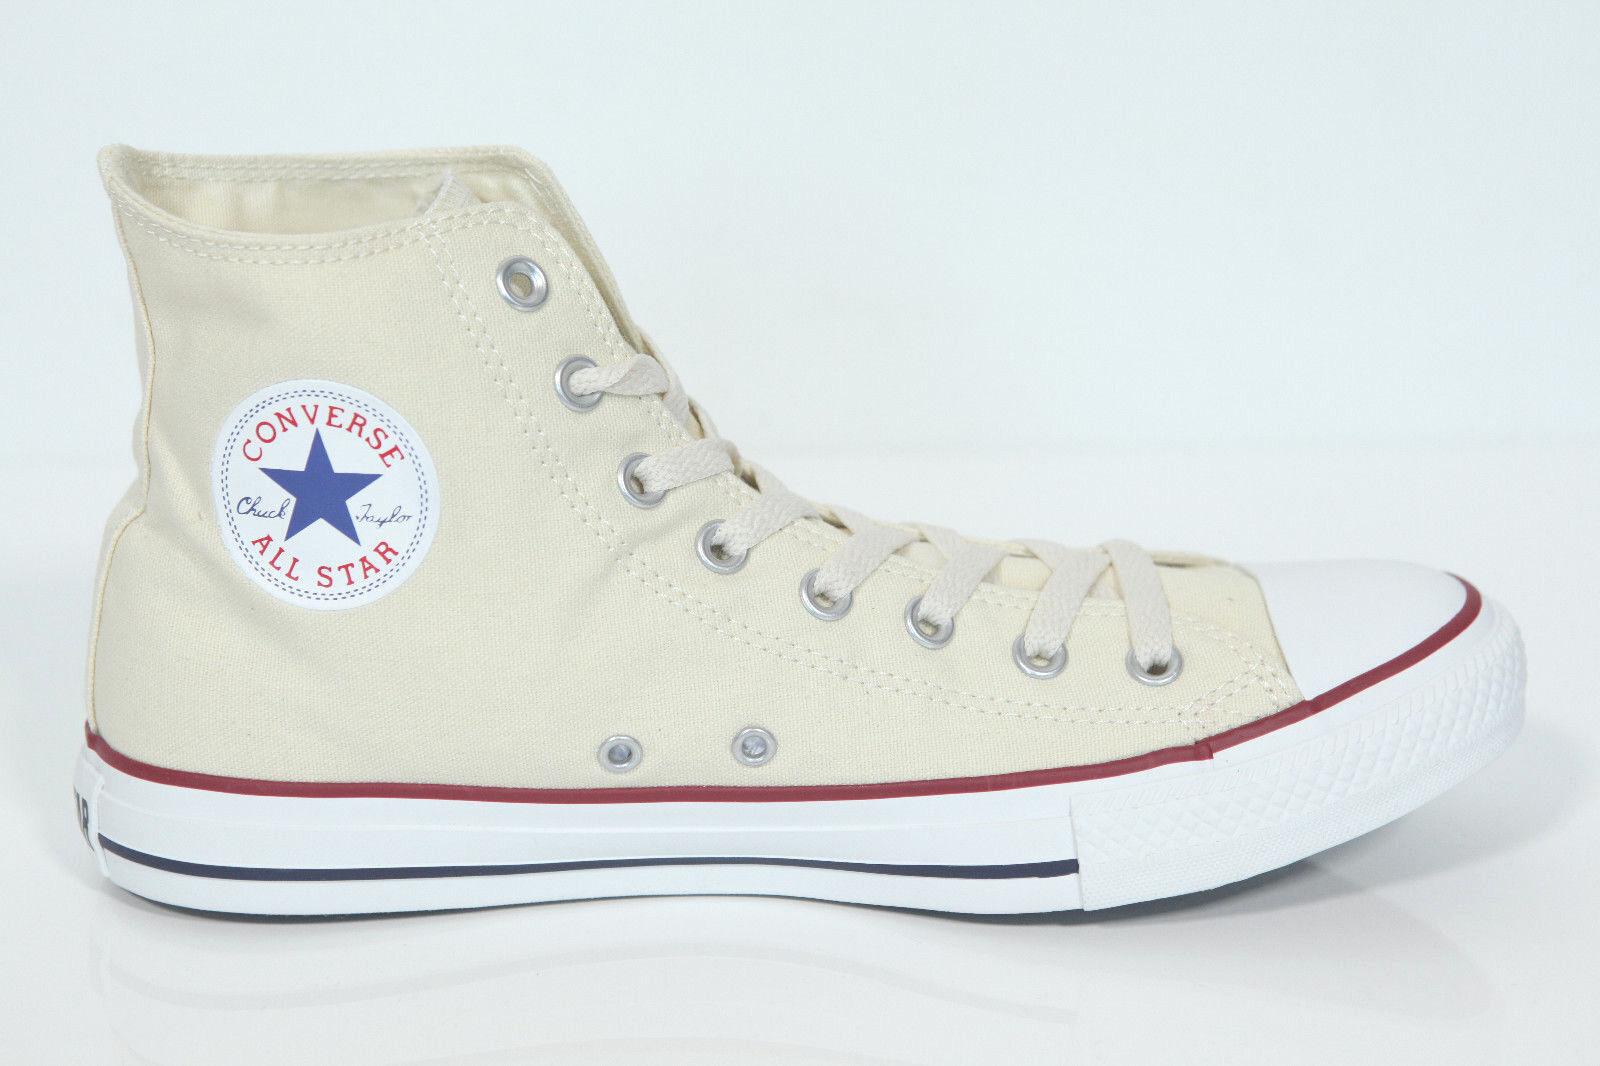 Neu All Star Converse Chucks Hi Sneaker Schuhe Ox Can Cremeweiss M9162 Retro